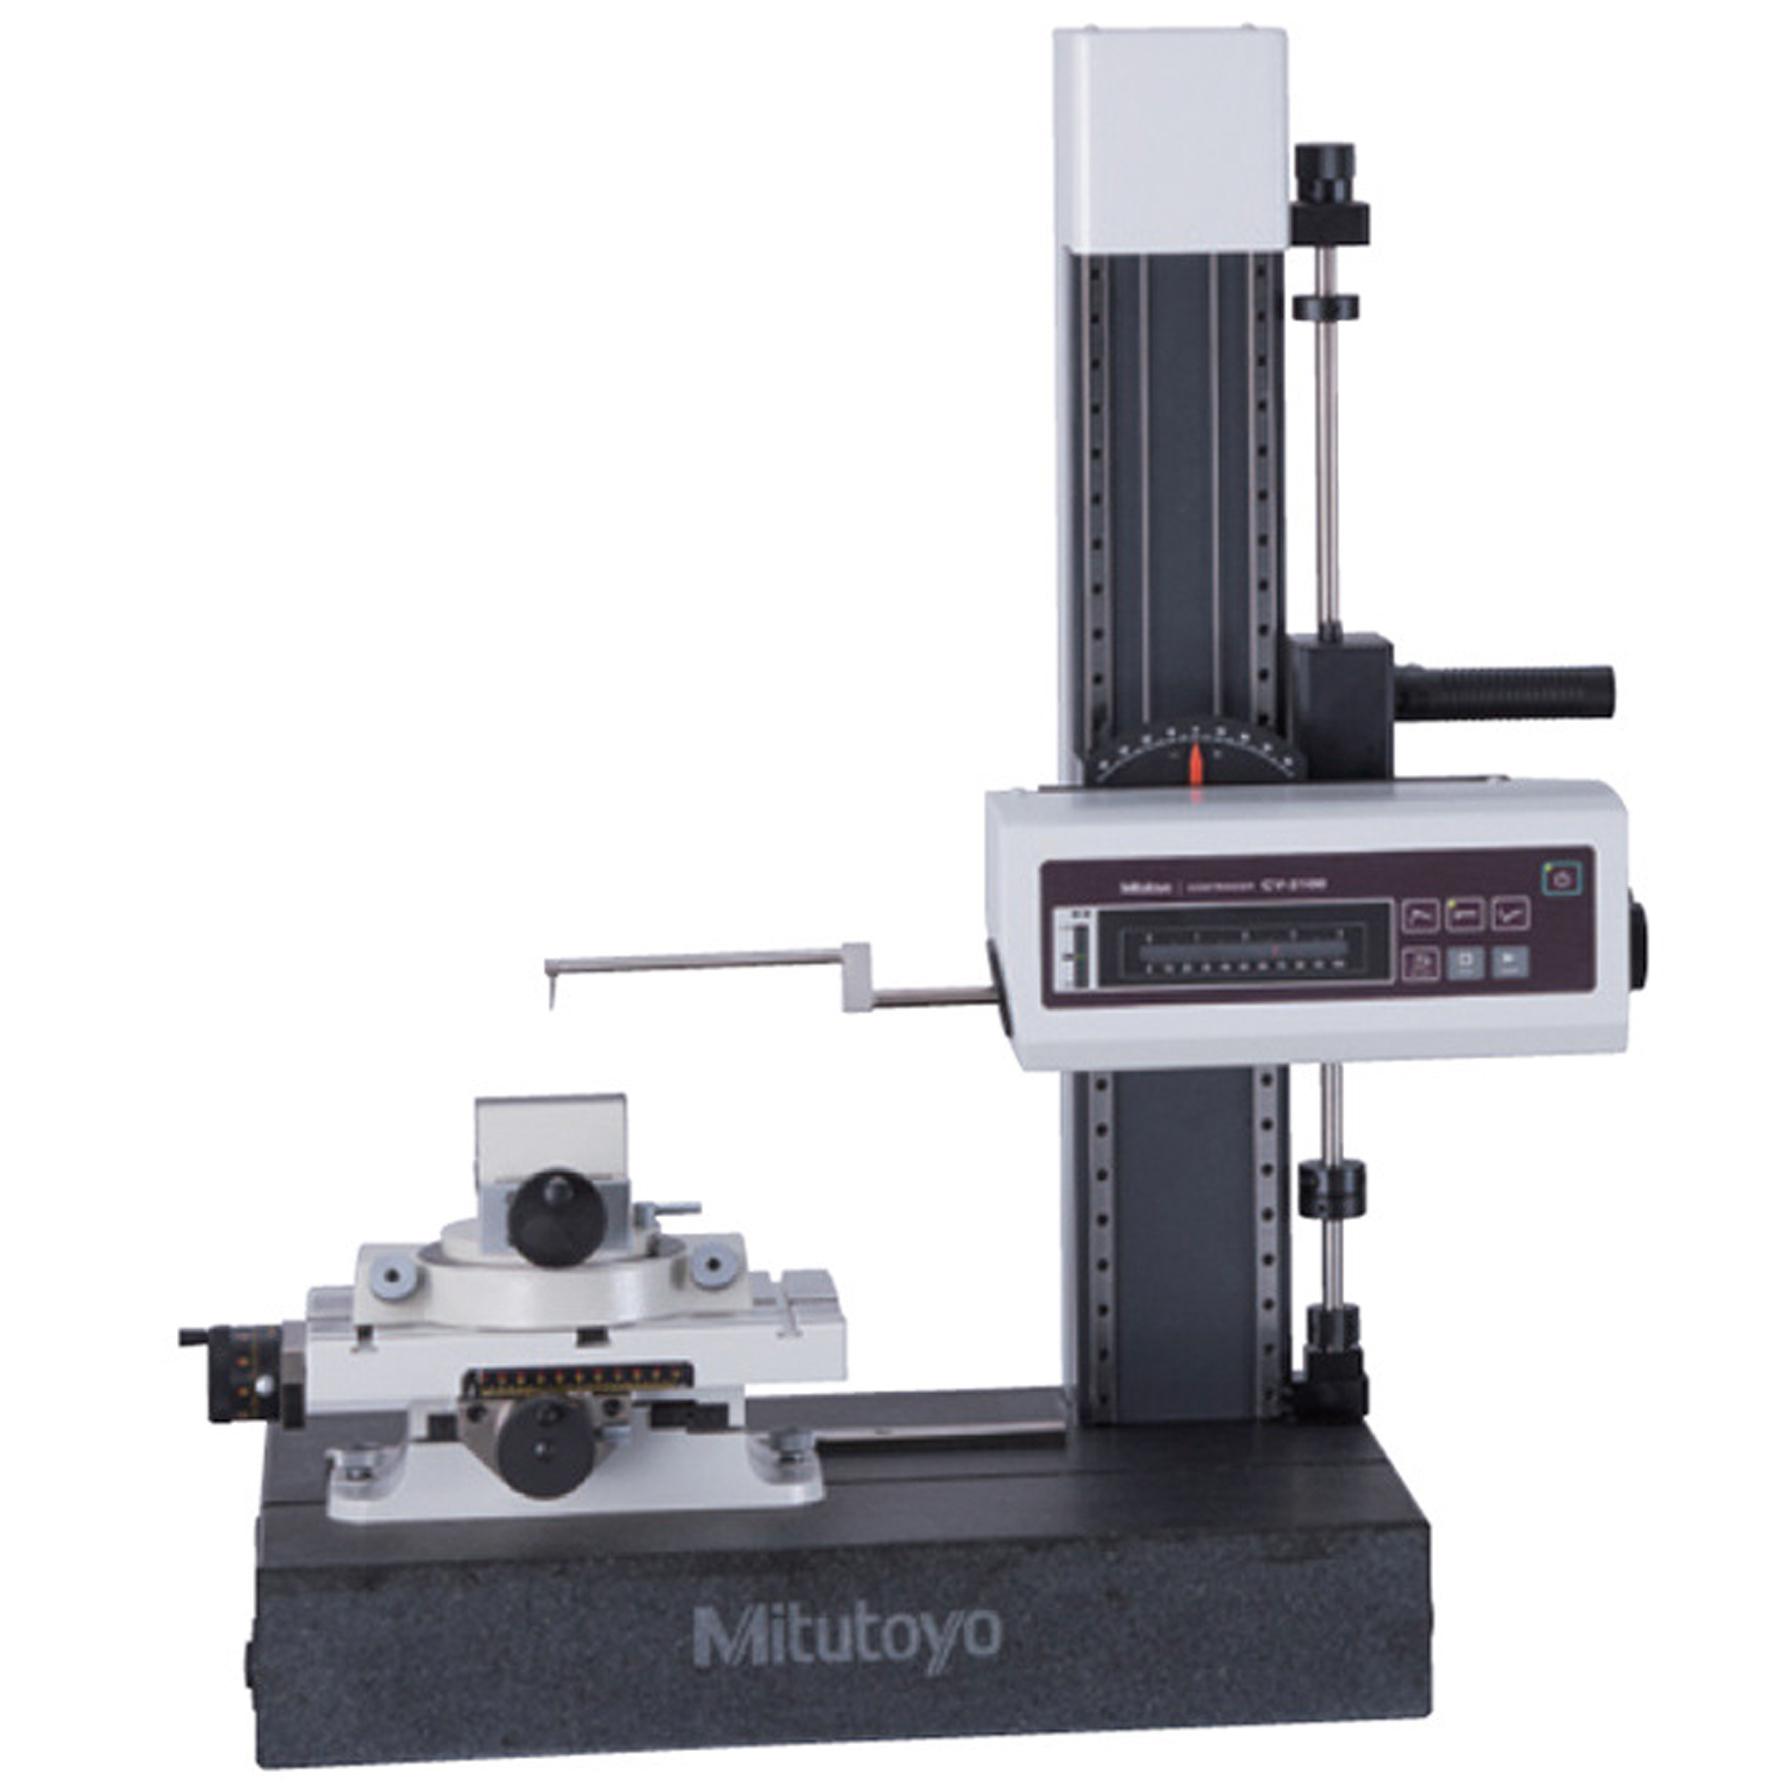 Contracer (manual) Maquinas de Contorno Series CV-2100 (CV-2100M4, CV-2100N4)